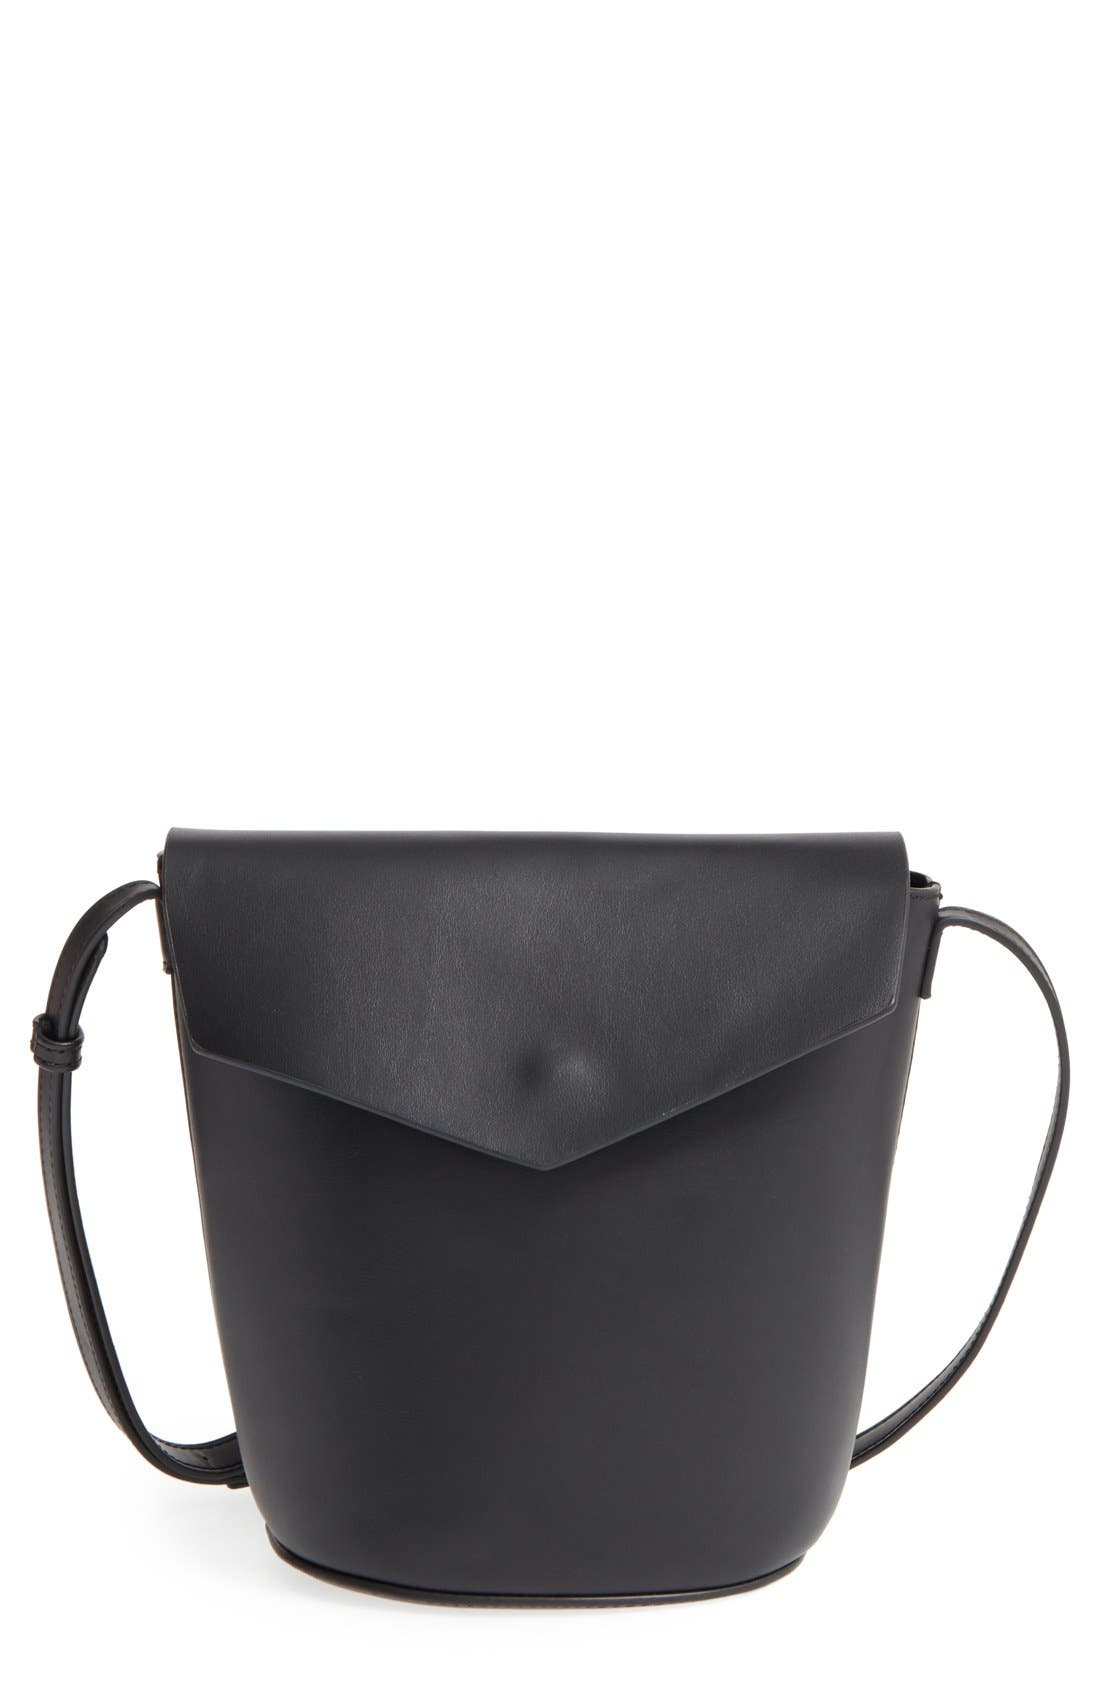 Main Image - Street Level Faux Leather Envelope Bucket Bag